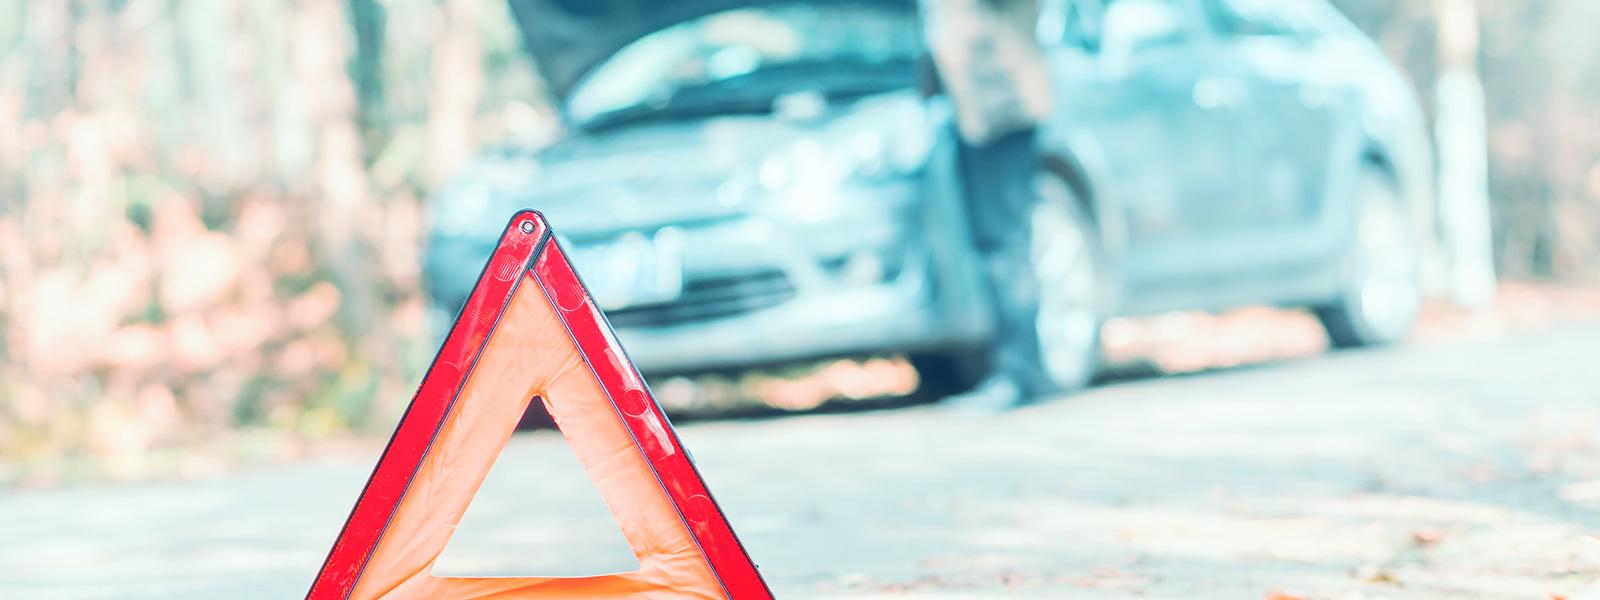 primeiros-socorros-acidentes-transito-blog-ceabs